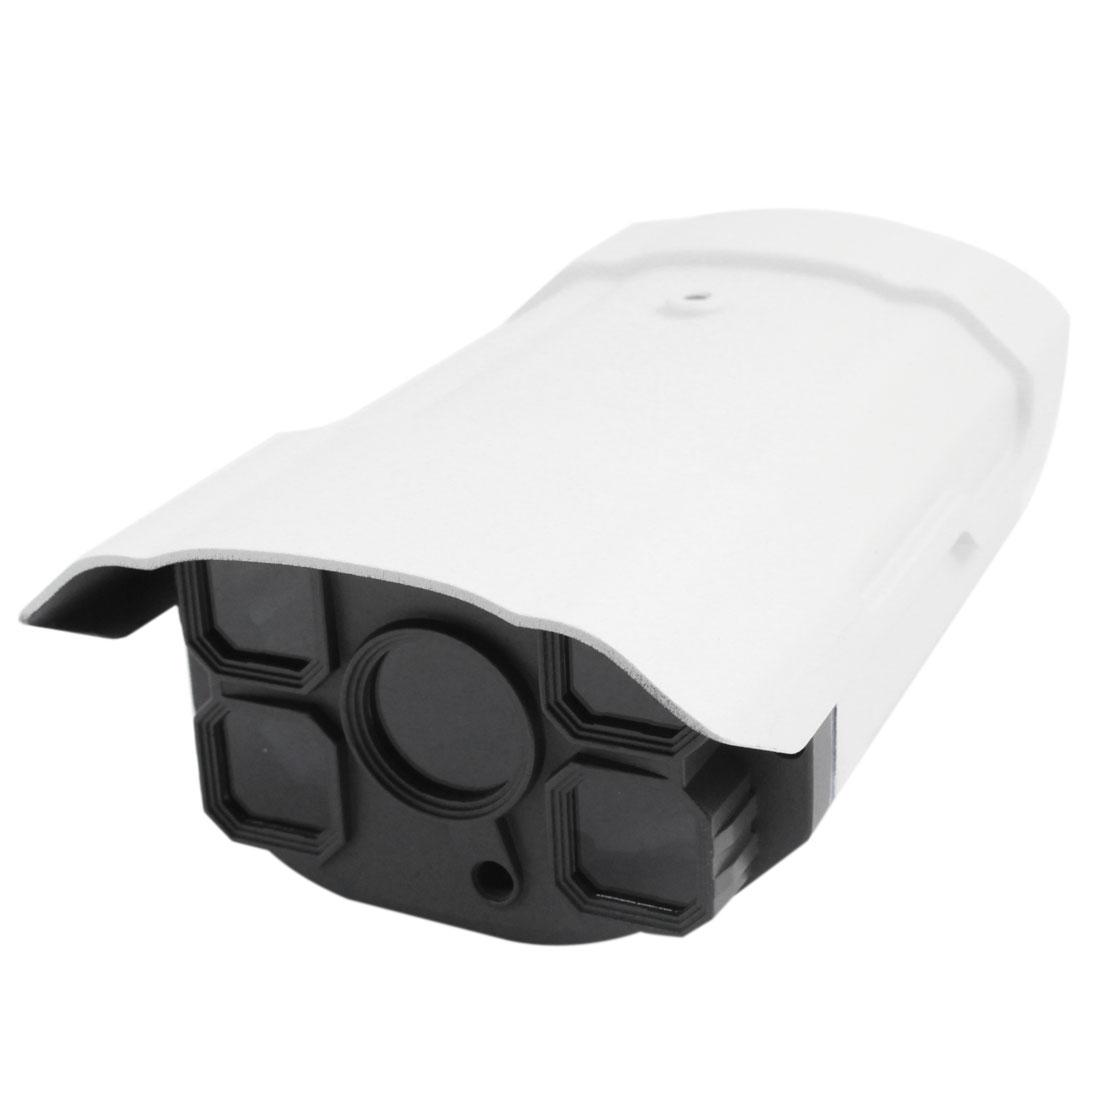 "Waterproof White Metal Array CCD Camera Housing Case 7.9"" x 4.9"" x 2.8"""